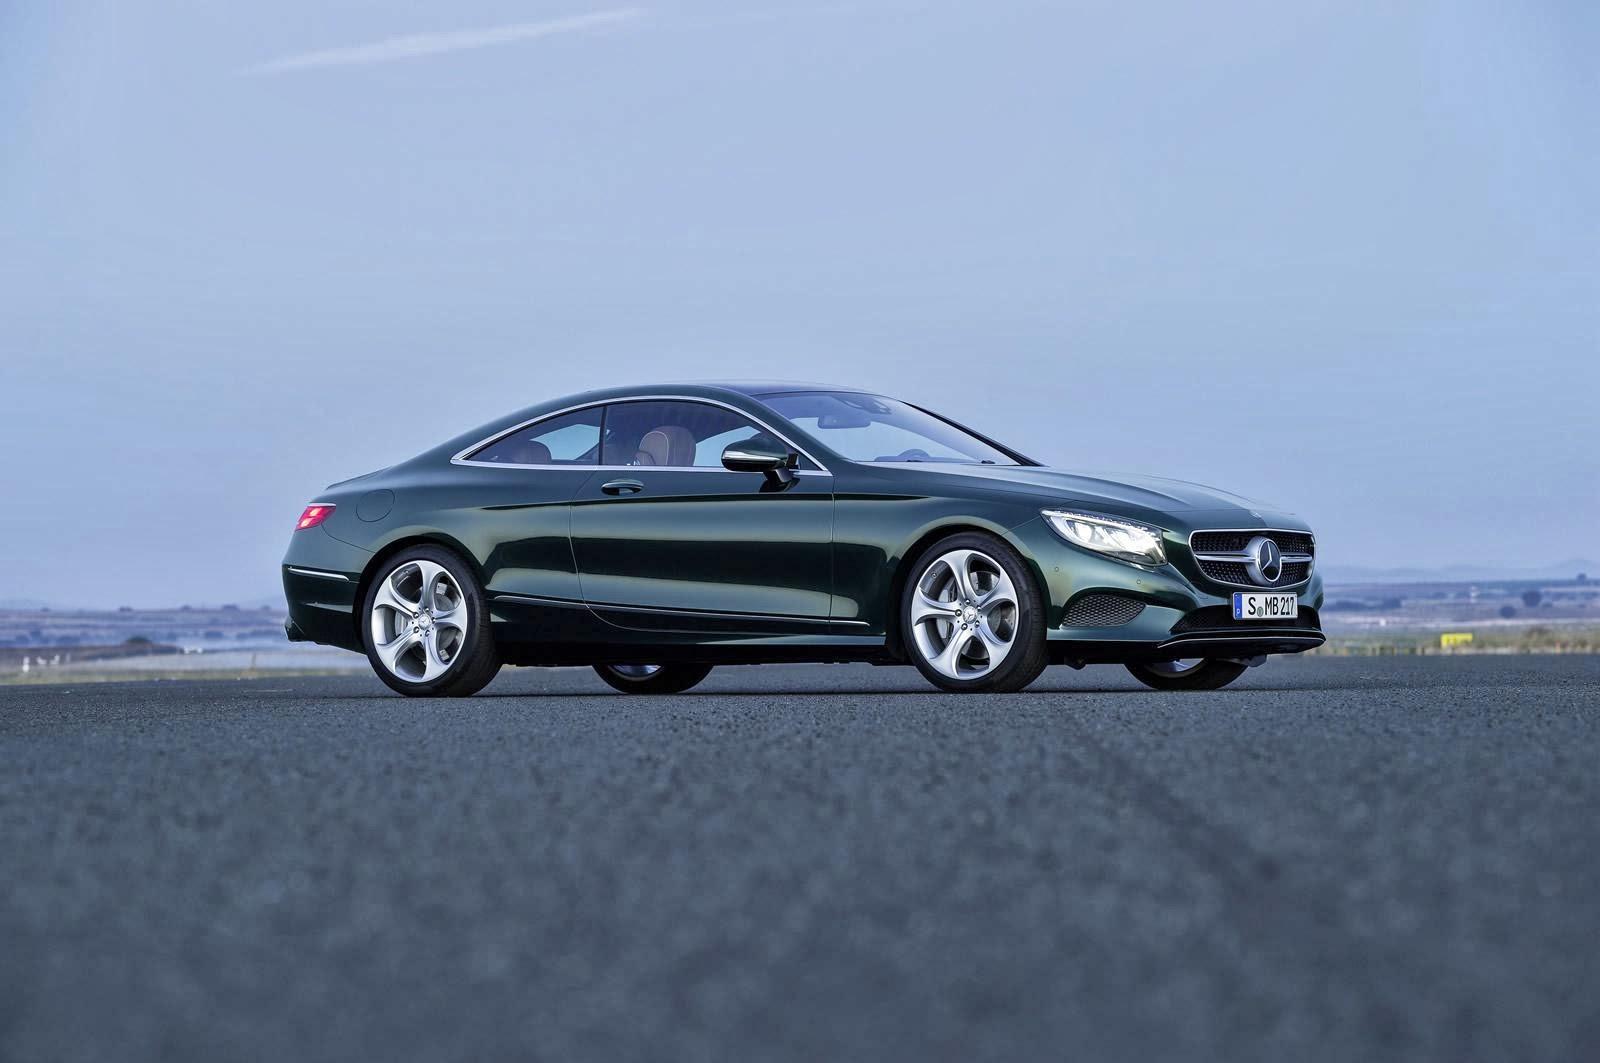 [Resim: Mercedes-Benz+S+Serisi+Coup%C3%A9+4.jpg]